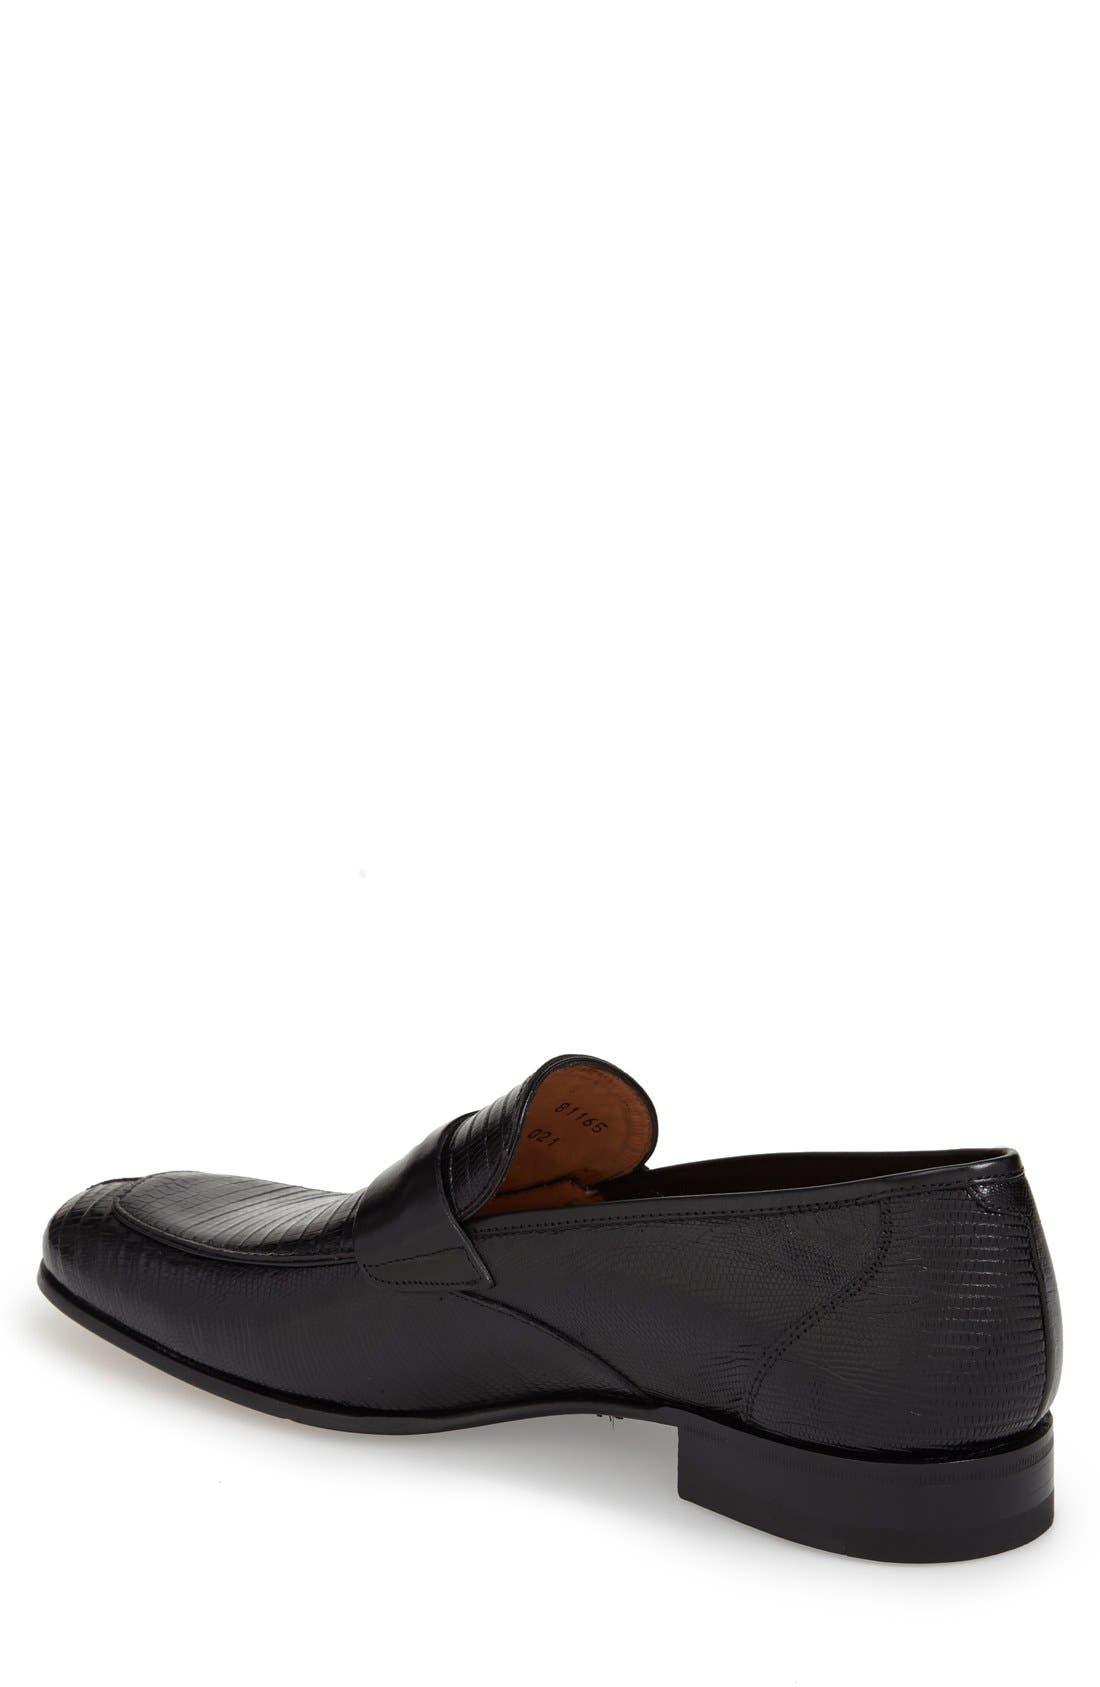 'Lipari' Lizard Leather Penny Loafer,                             Alternate thumbnail 2, color,                             BLACK